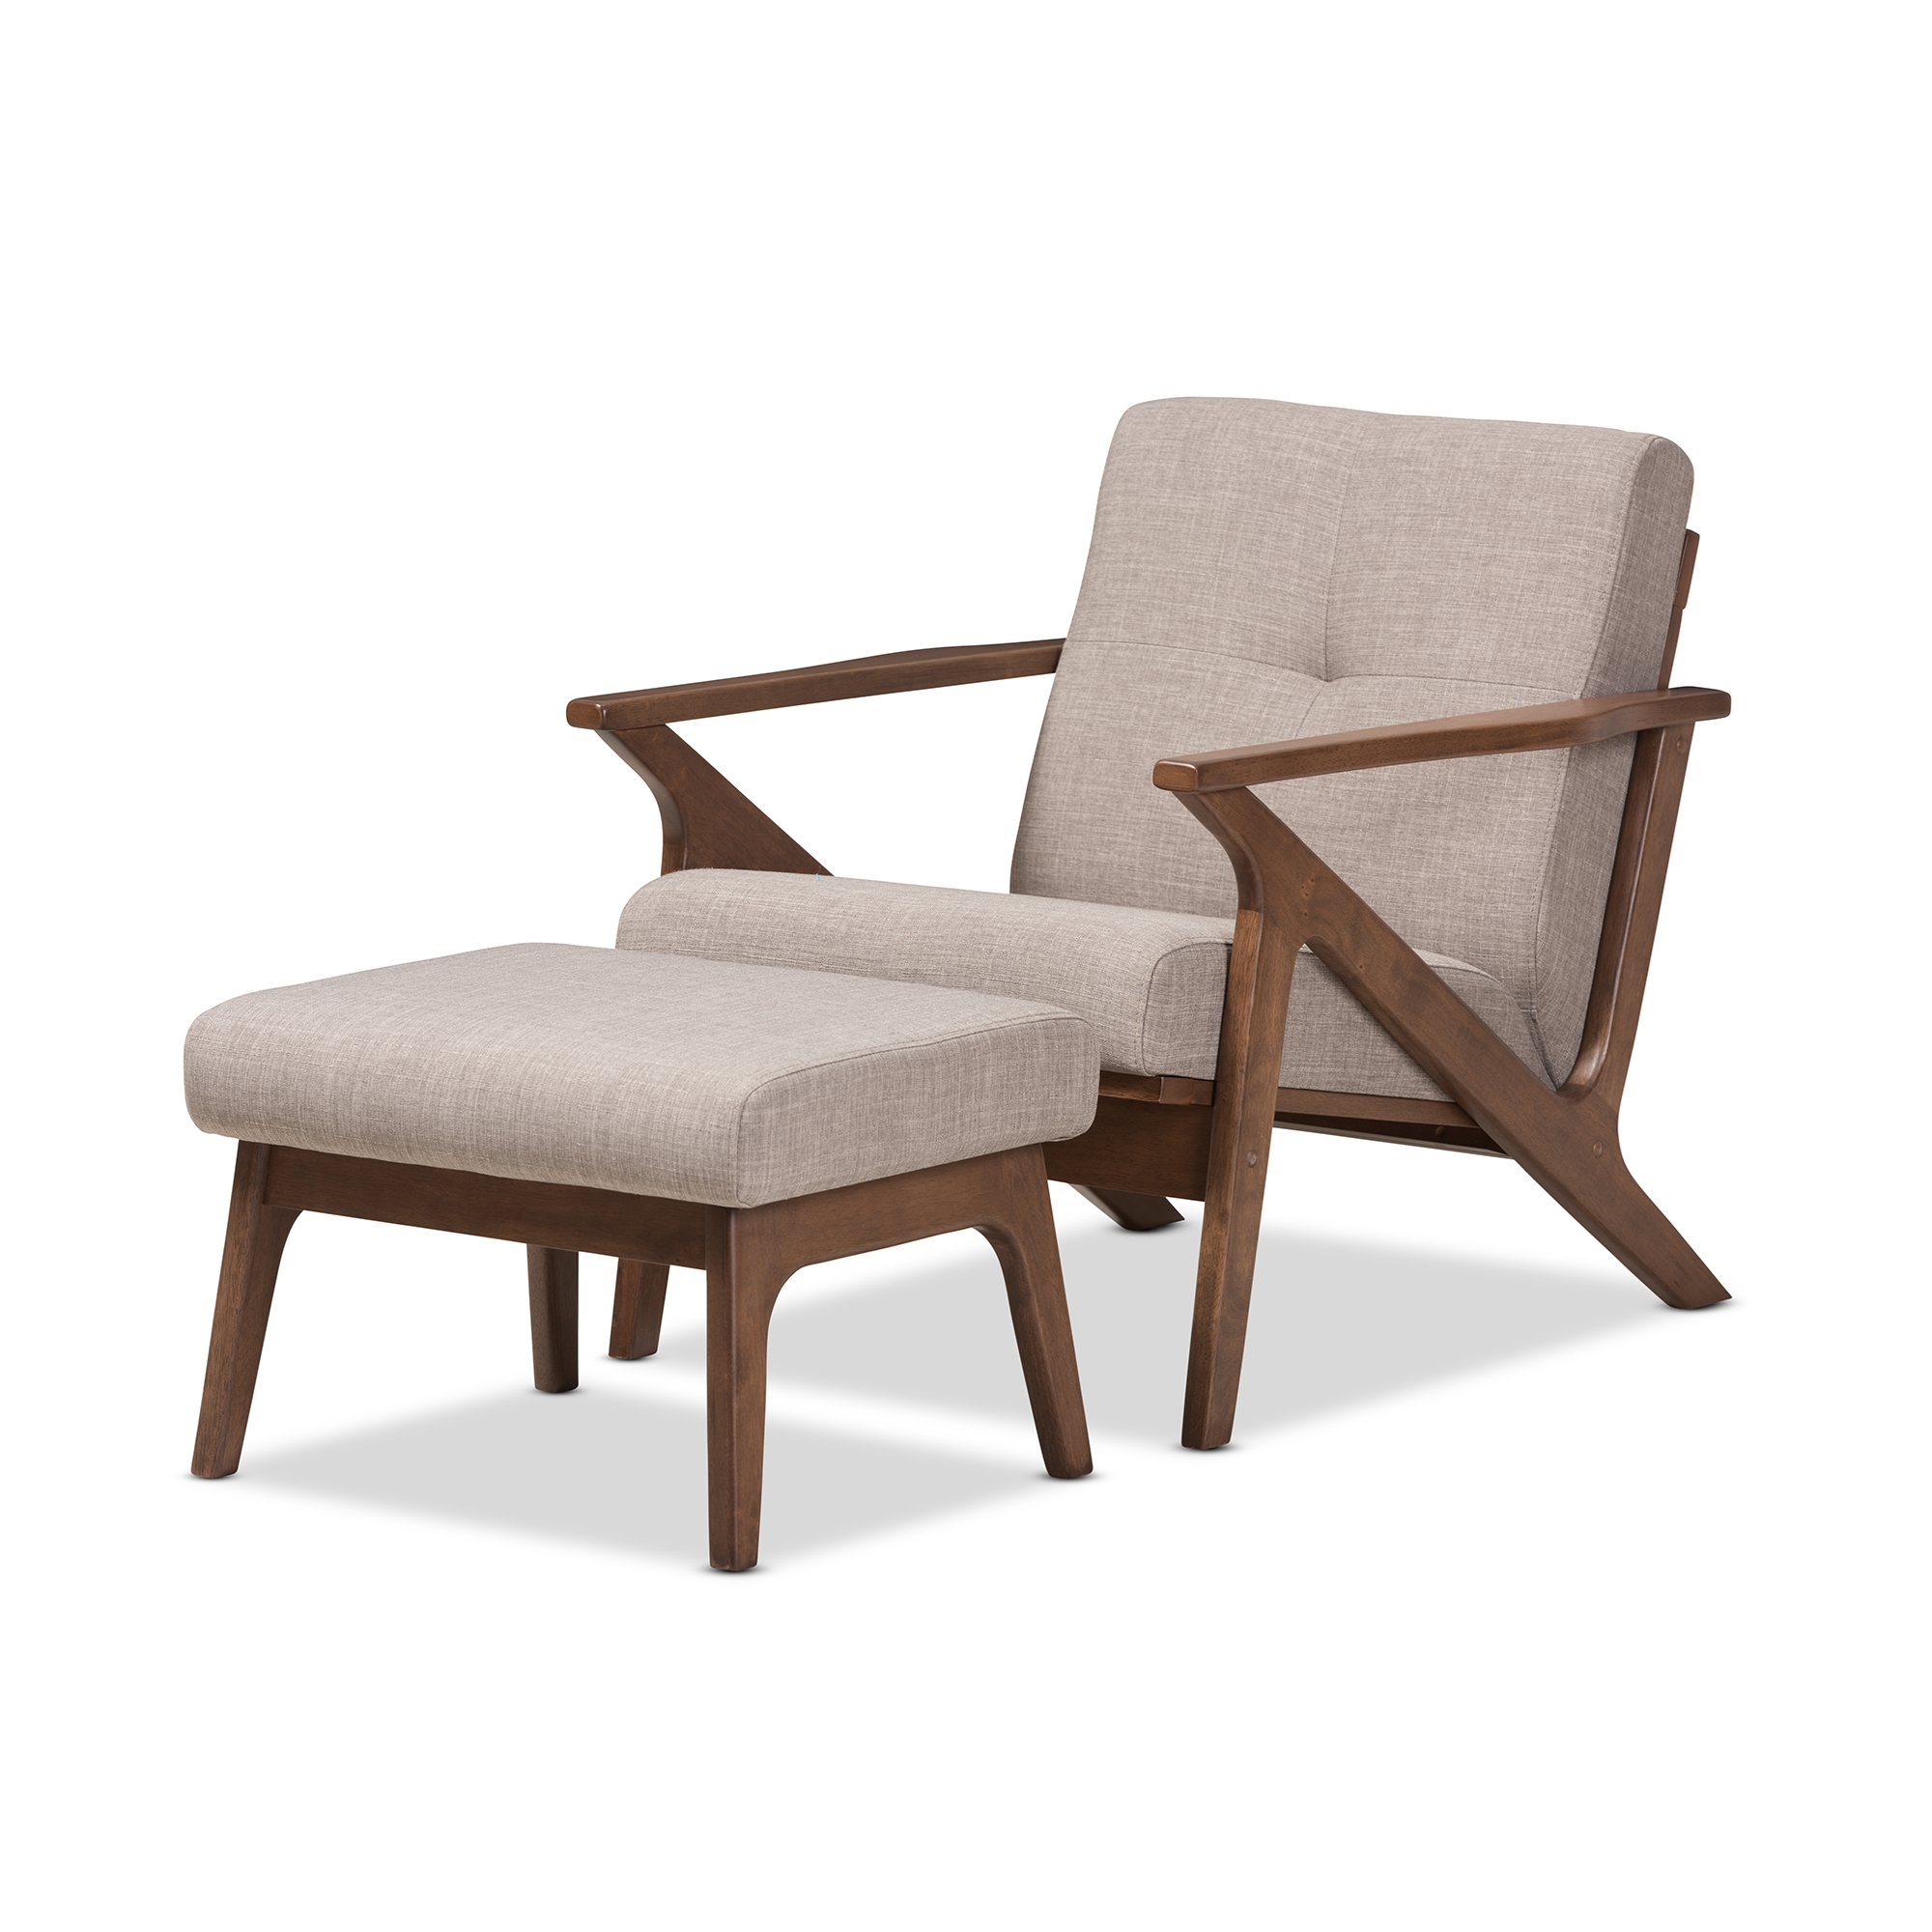 chair and ottoman sets. baxton studio bianca mid-century modern walnut wood light grey fabric tufted lounge chair and ottoman sets